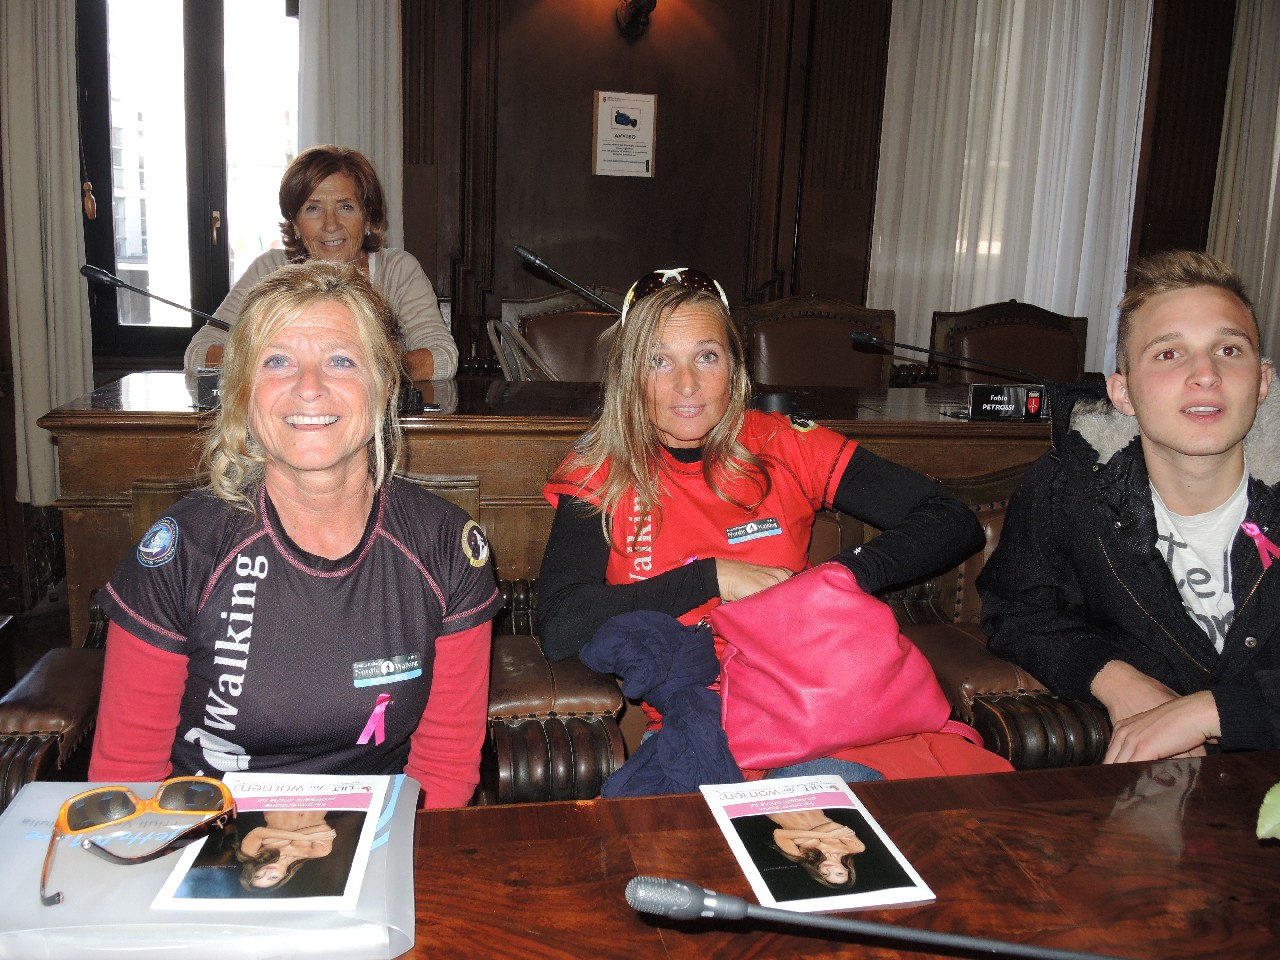 2015-10-02 Nordic Walking - LILT - Nastro Rosa (10)